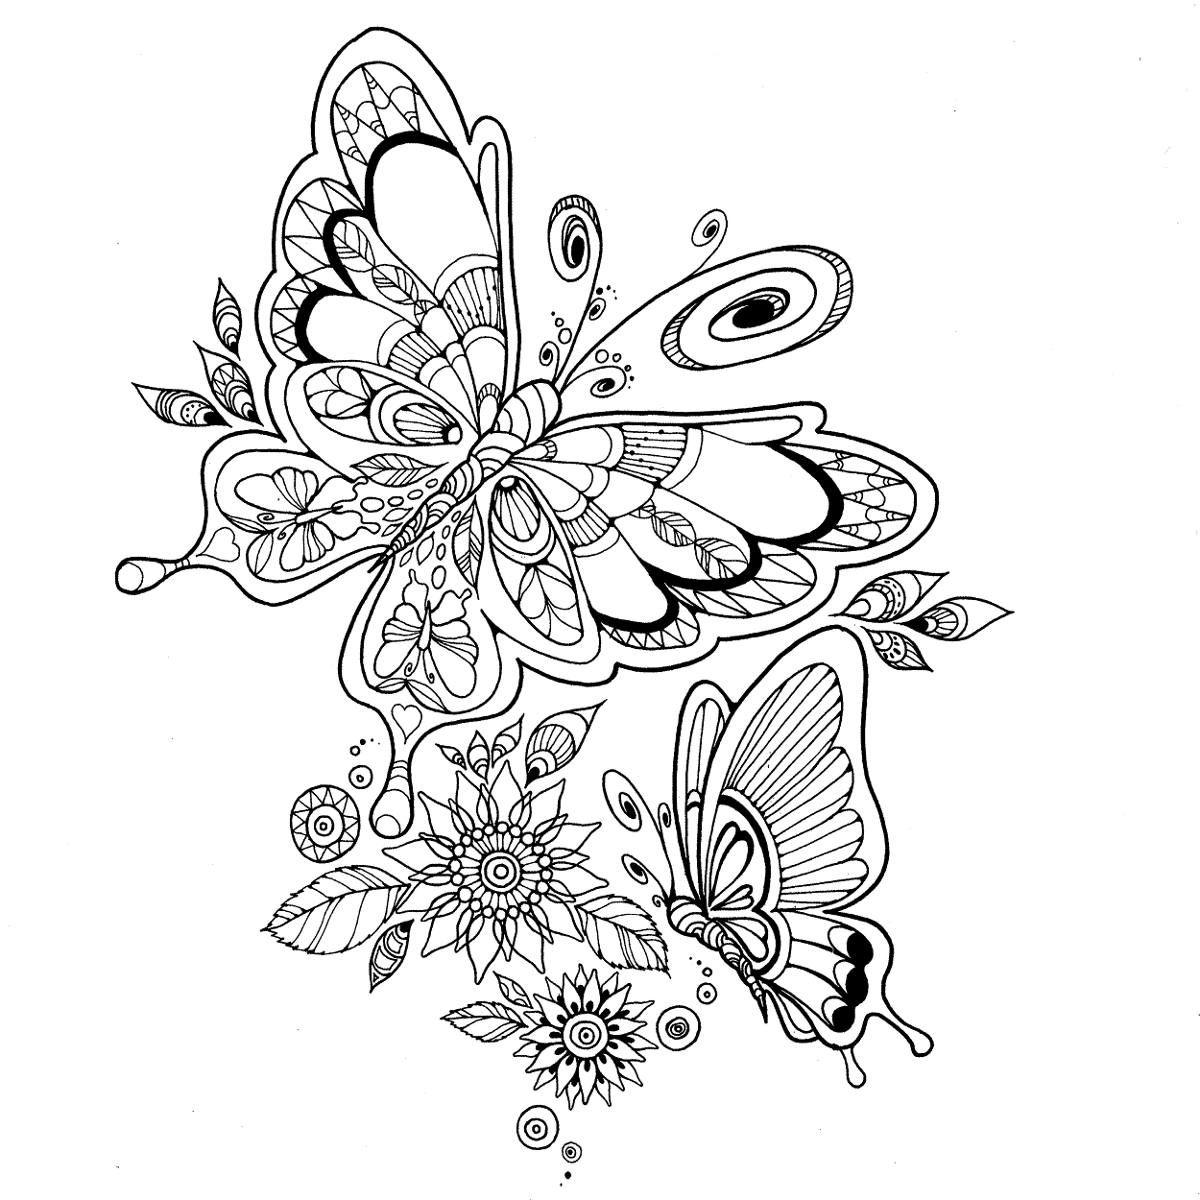 mandalas dibujos - Buscar con Google | colorea!!!!!! | Pinterest ...